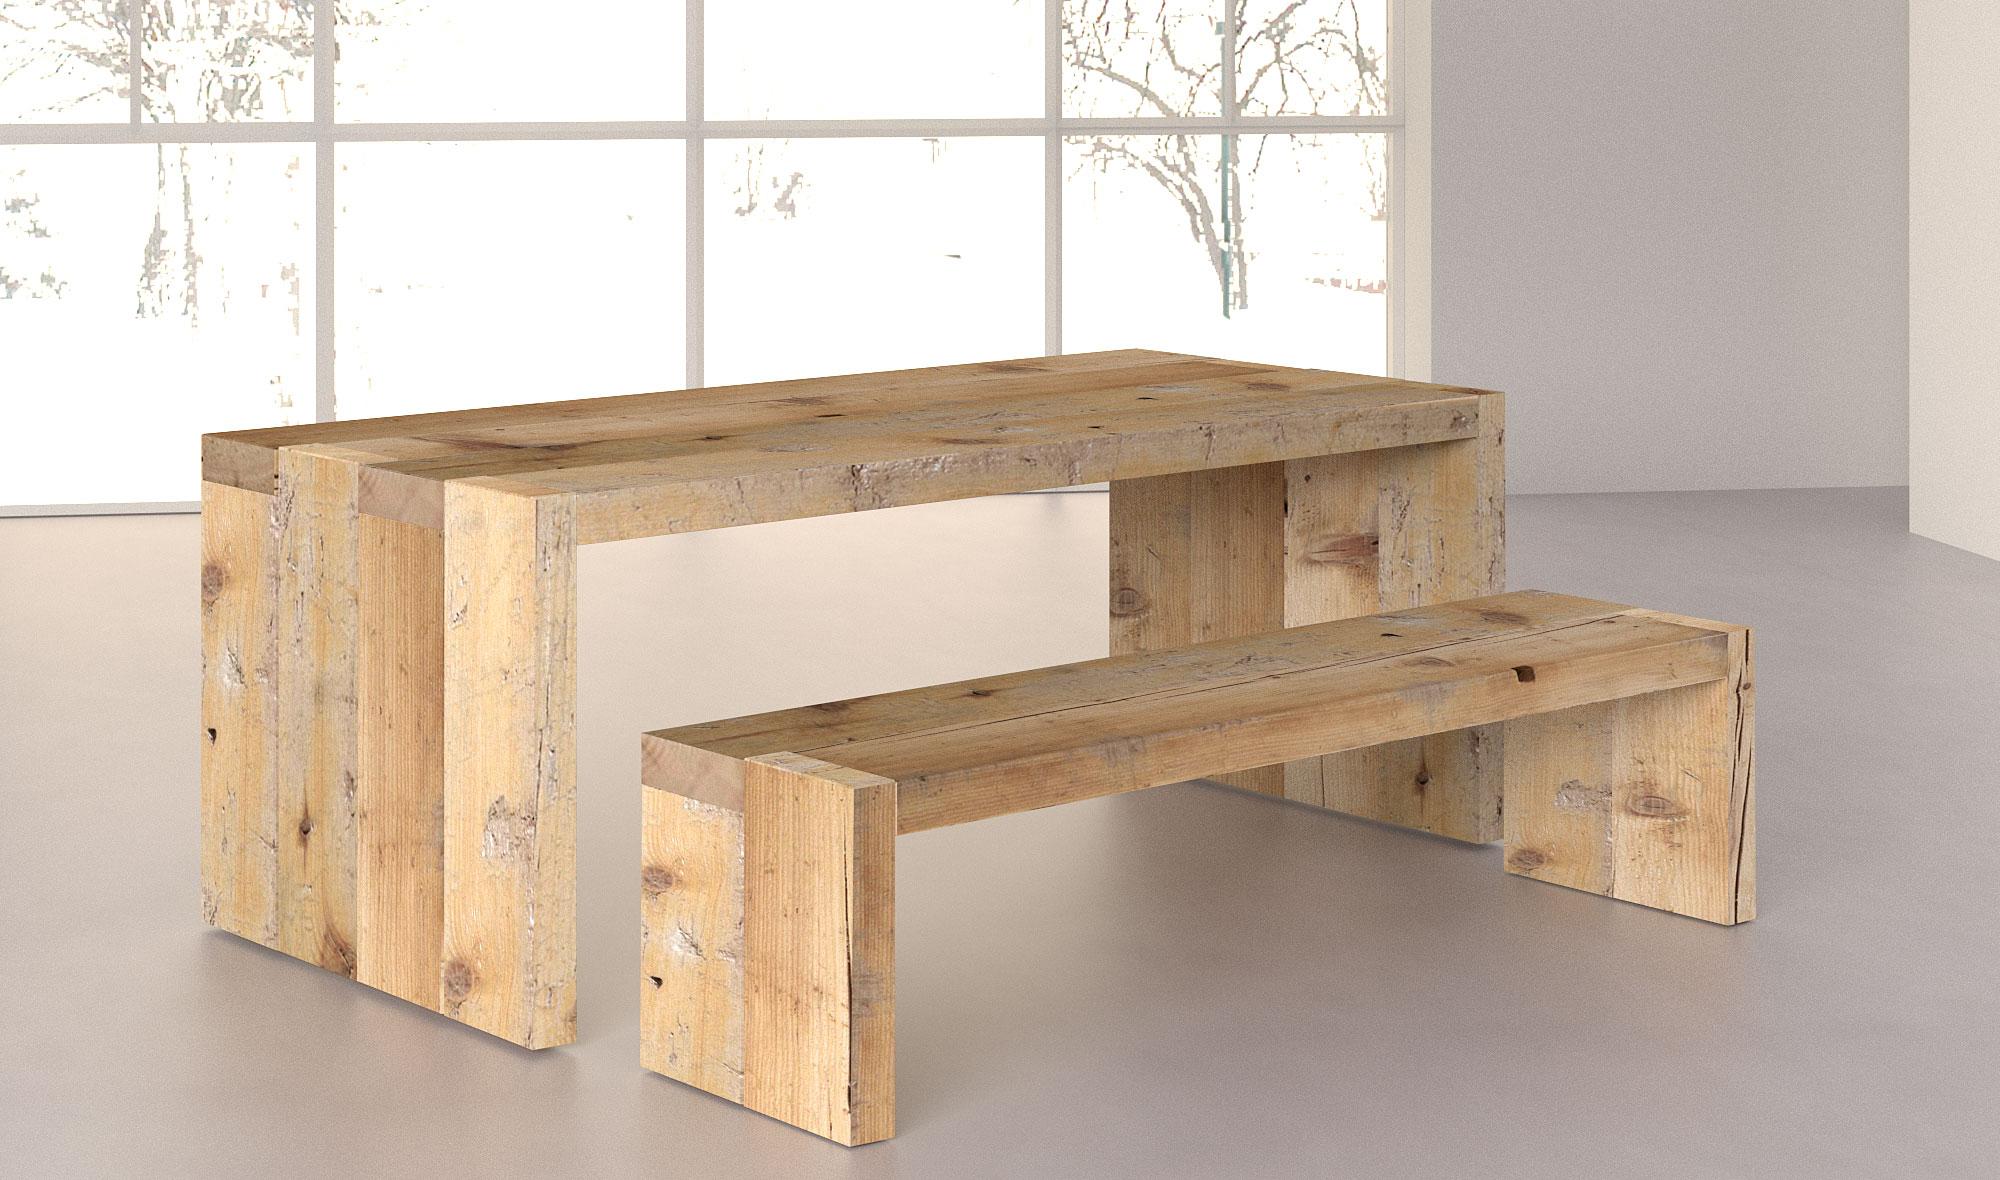 Mesa comedor Denver de madera centenaria de lujo en ...